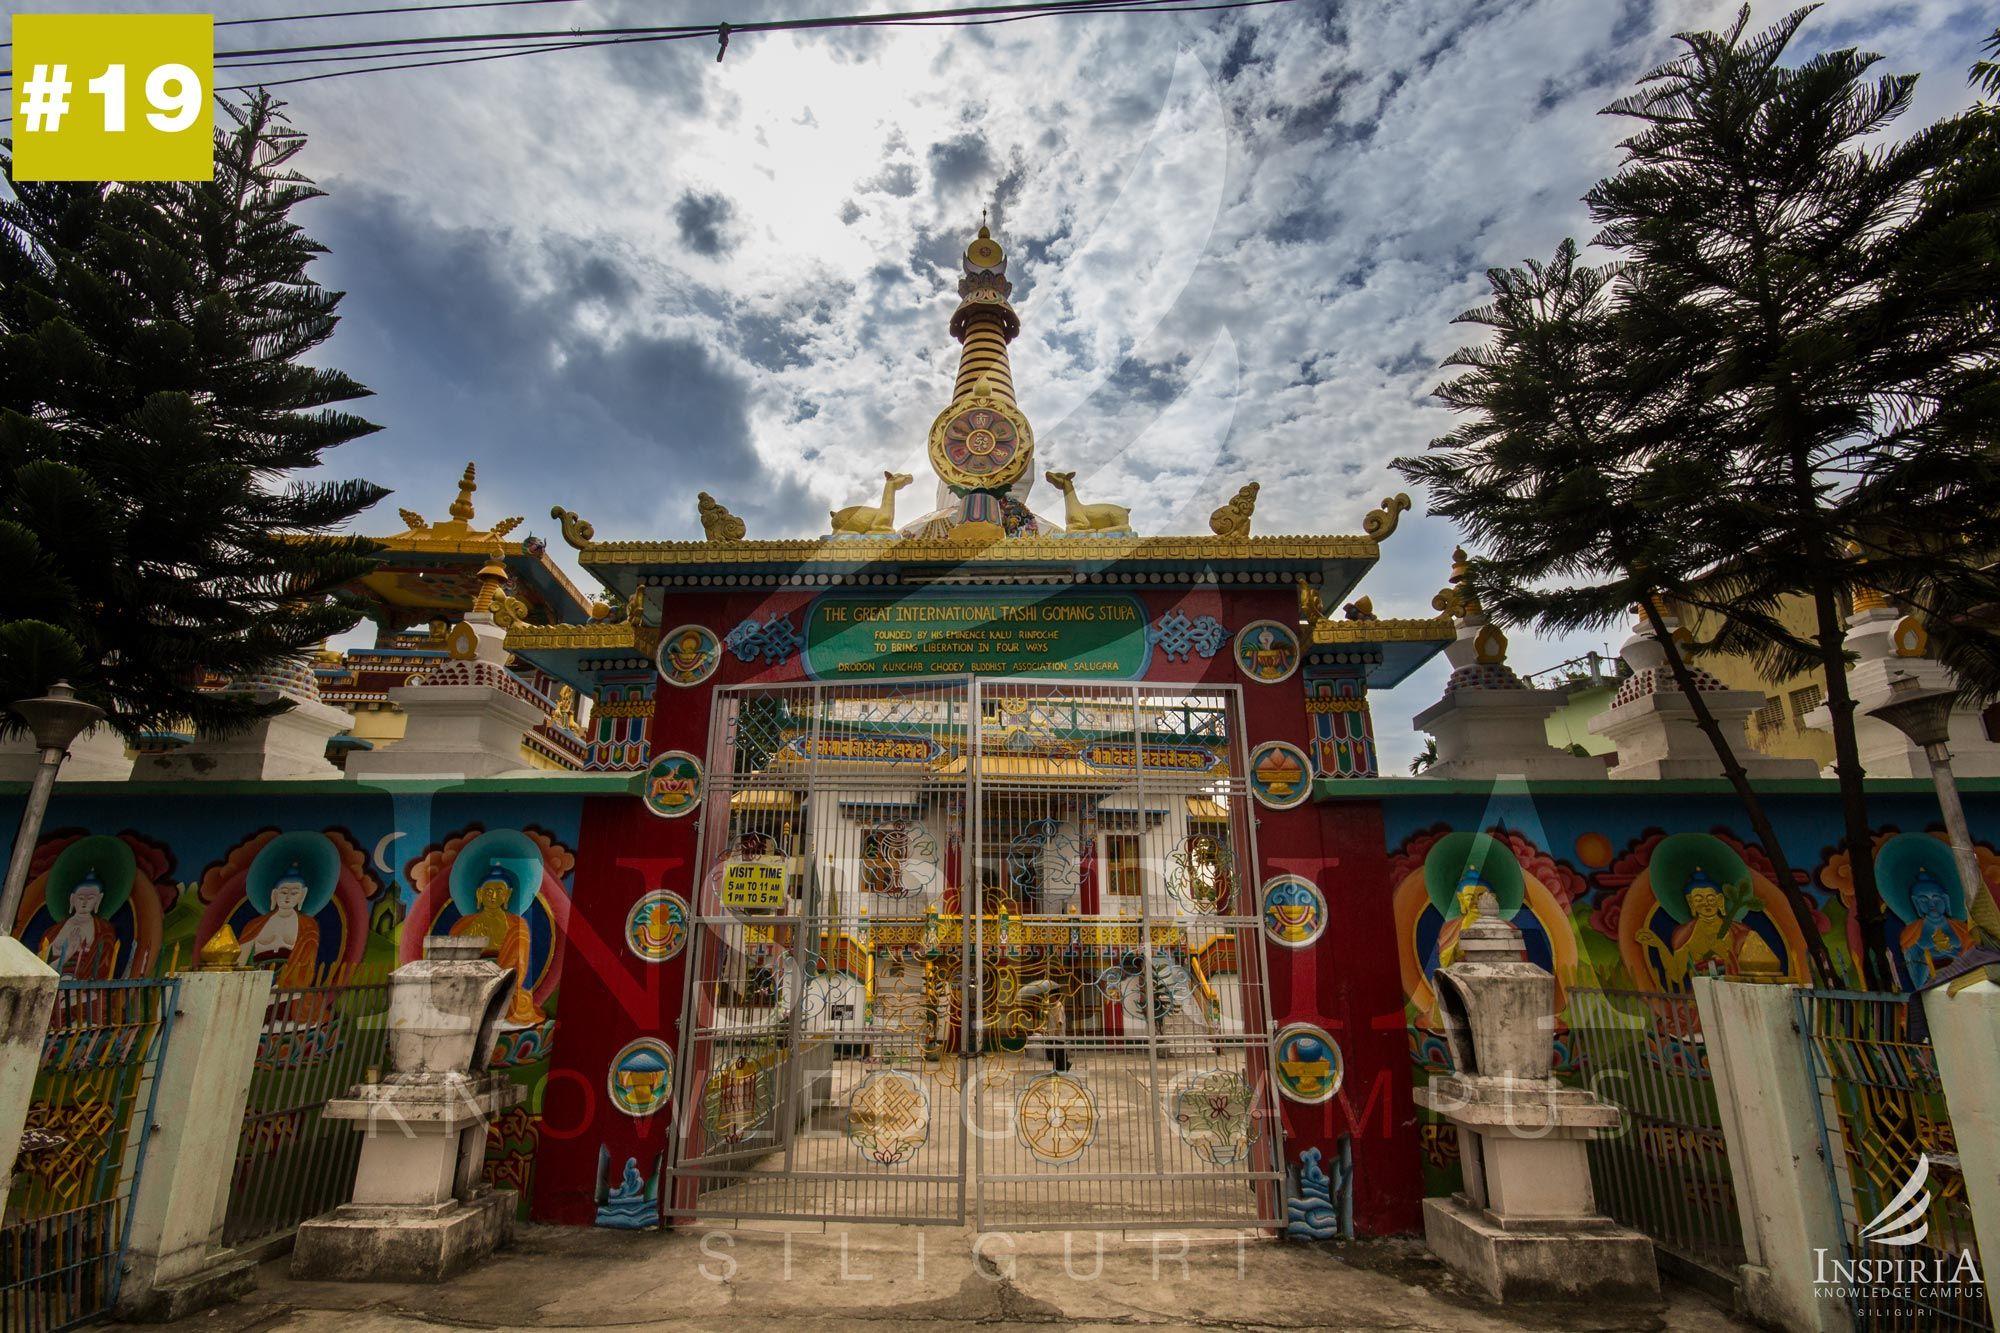 salugara-monastery-siliguri-inspiria-knowledge-campus-1001-things-to-do-front-gate-wb